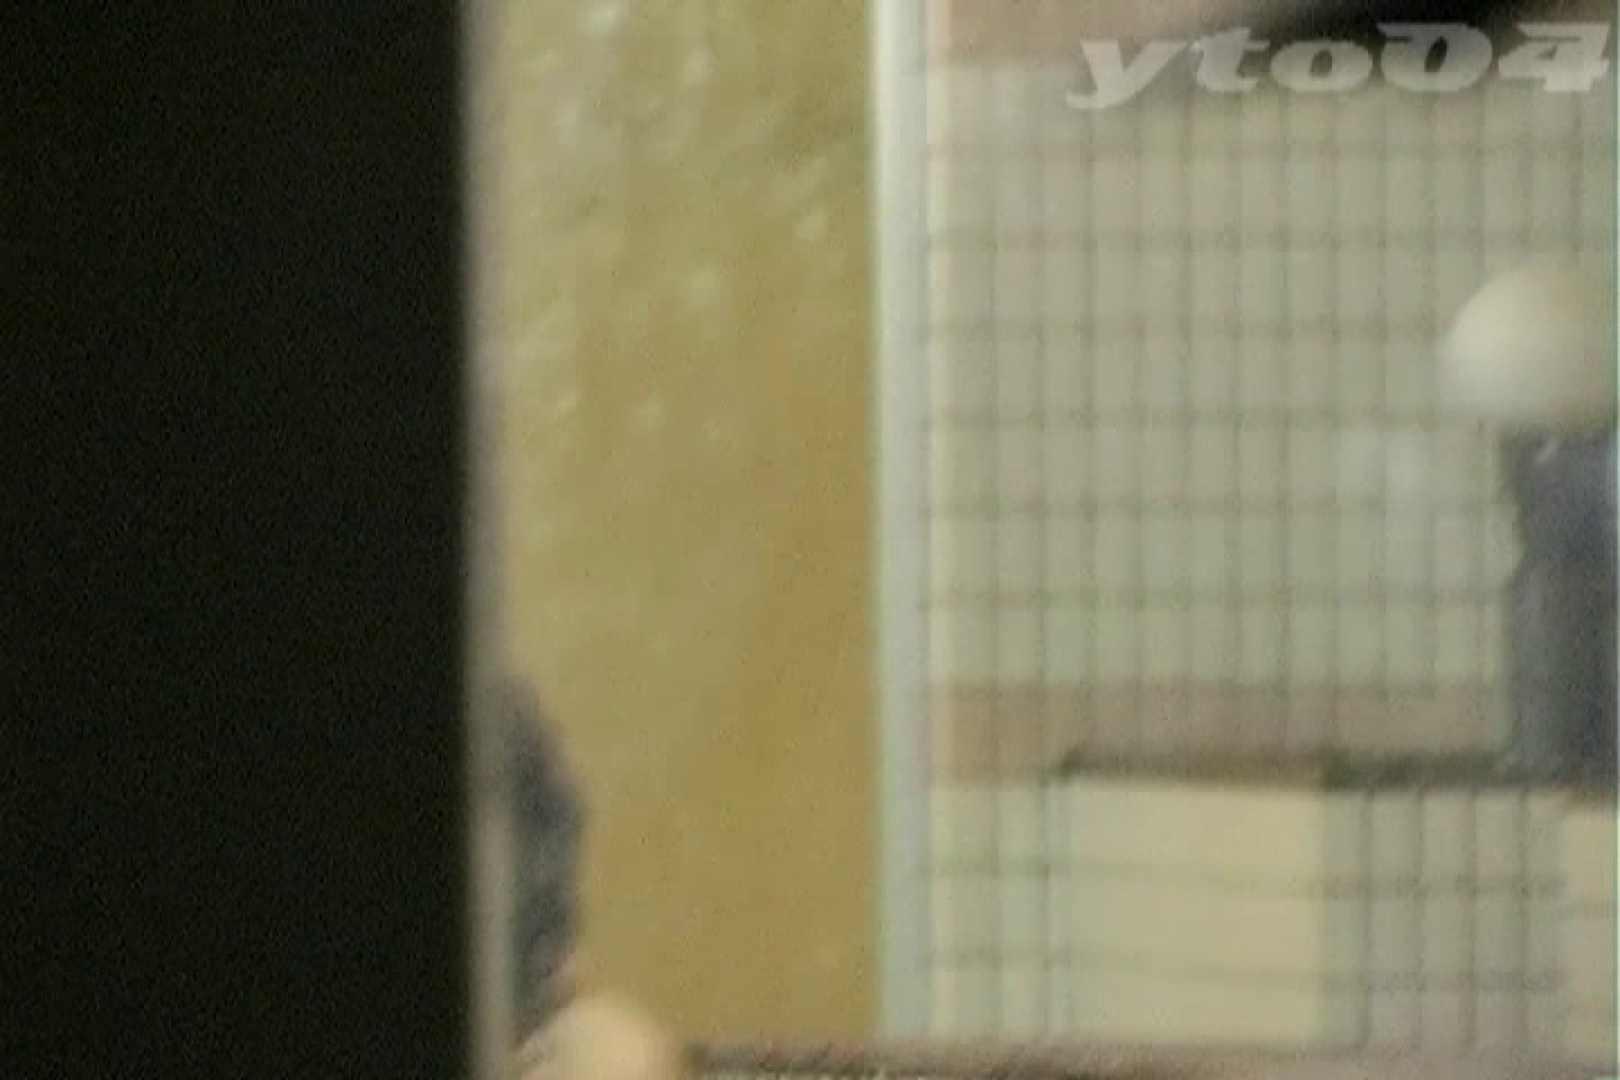 ▲復活限定▲合宿ホテル女風呂盗撮 Vol.24 ホテル 盗撮動画紹介 50PIX 15